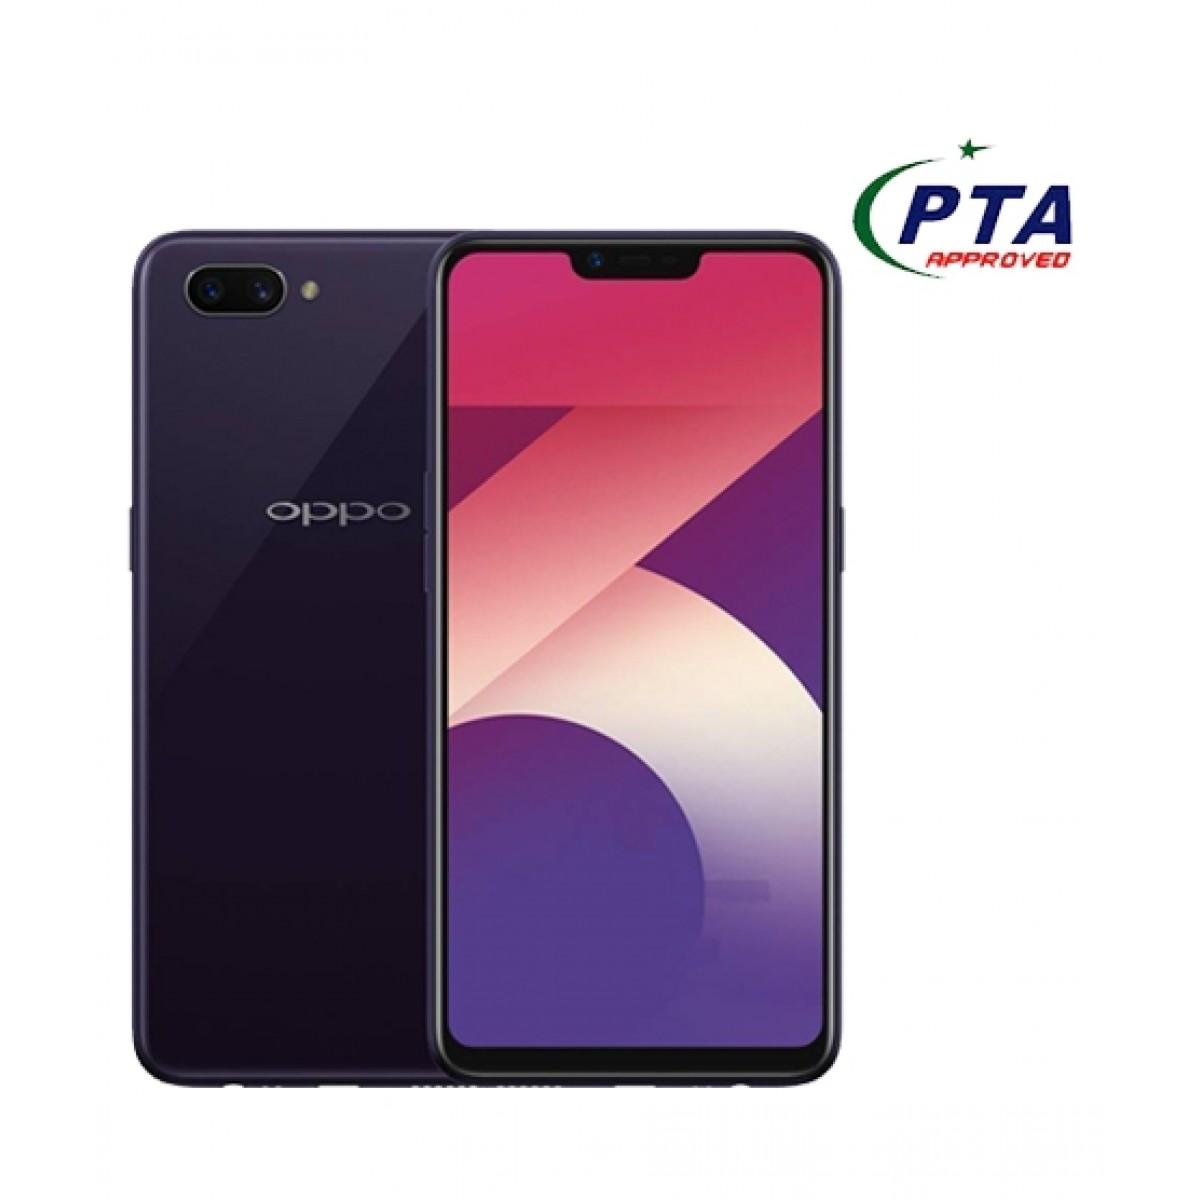 Oppo A3s 16GB Dual Sim Dark Purple